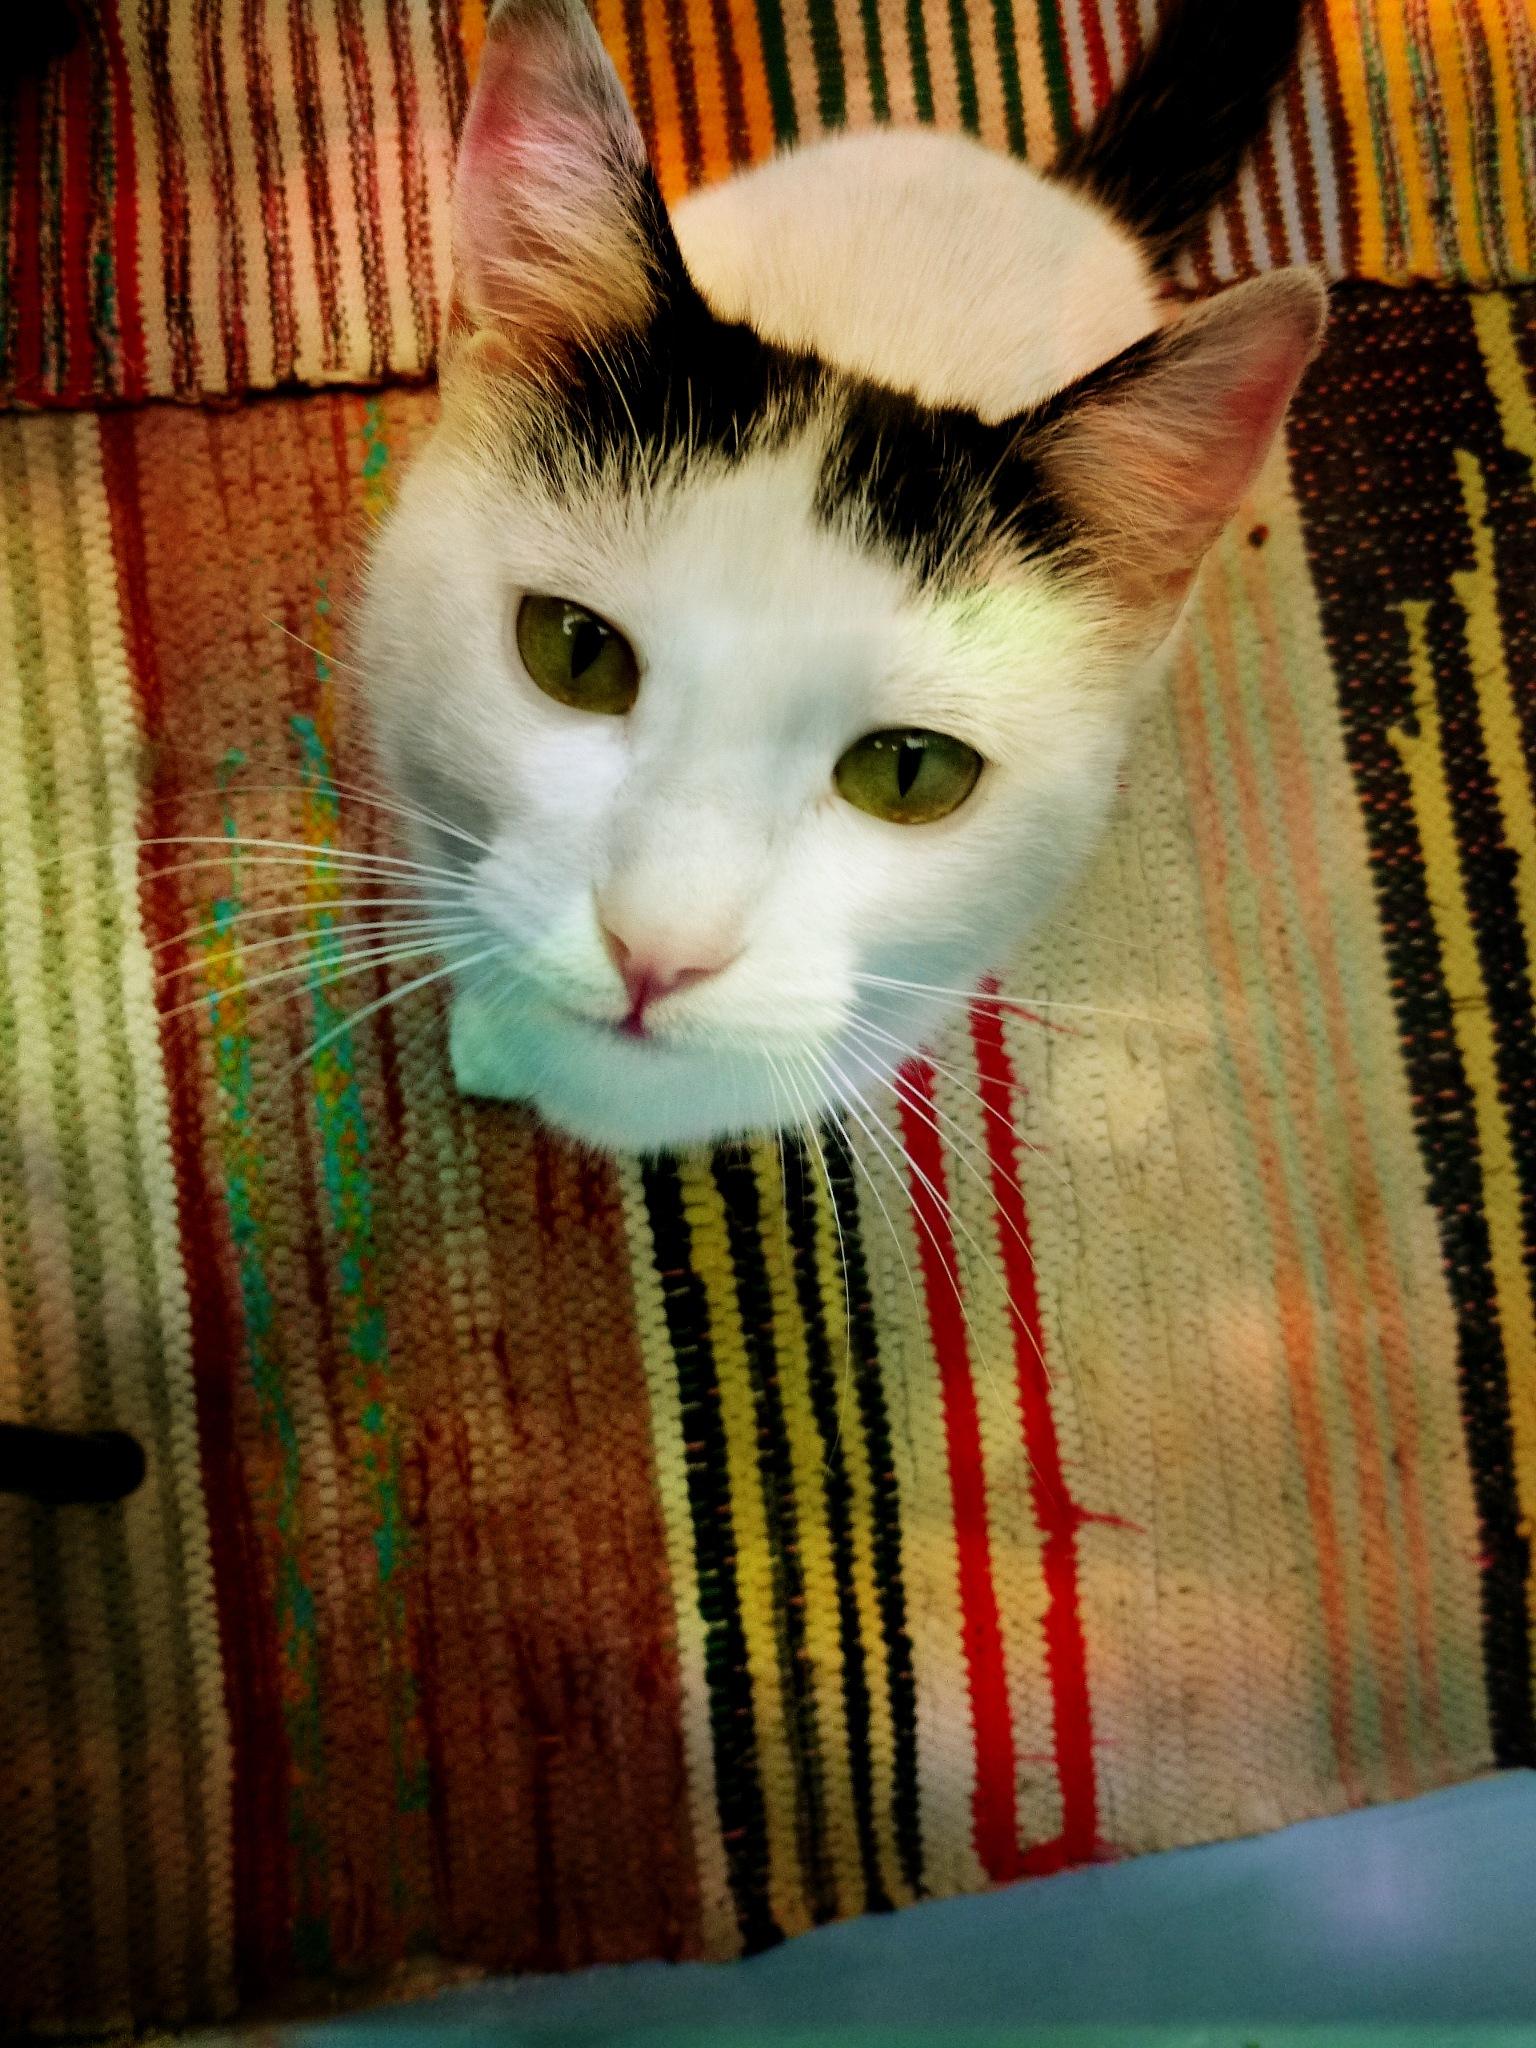 Cat portret by SizredMCMXCIV